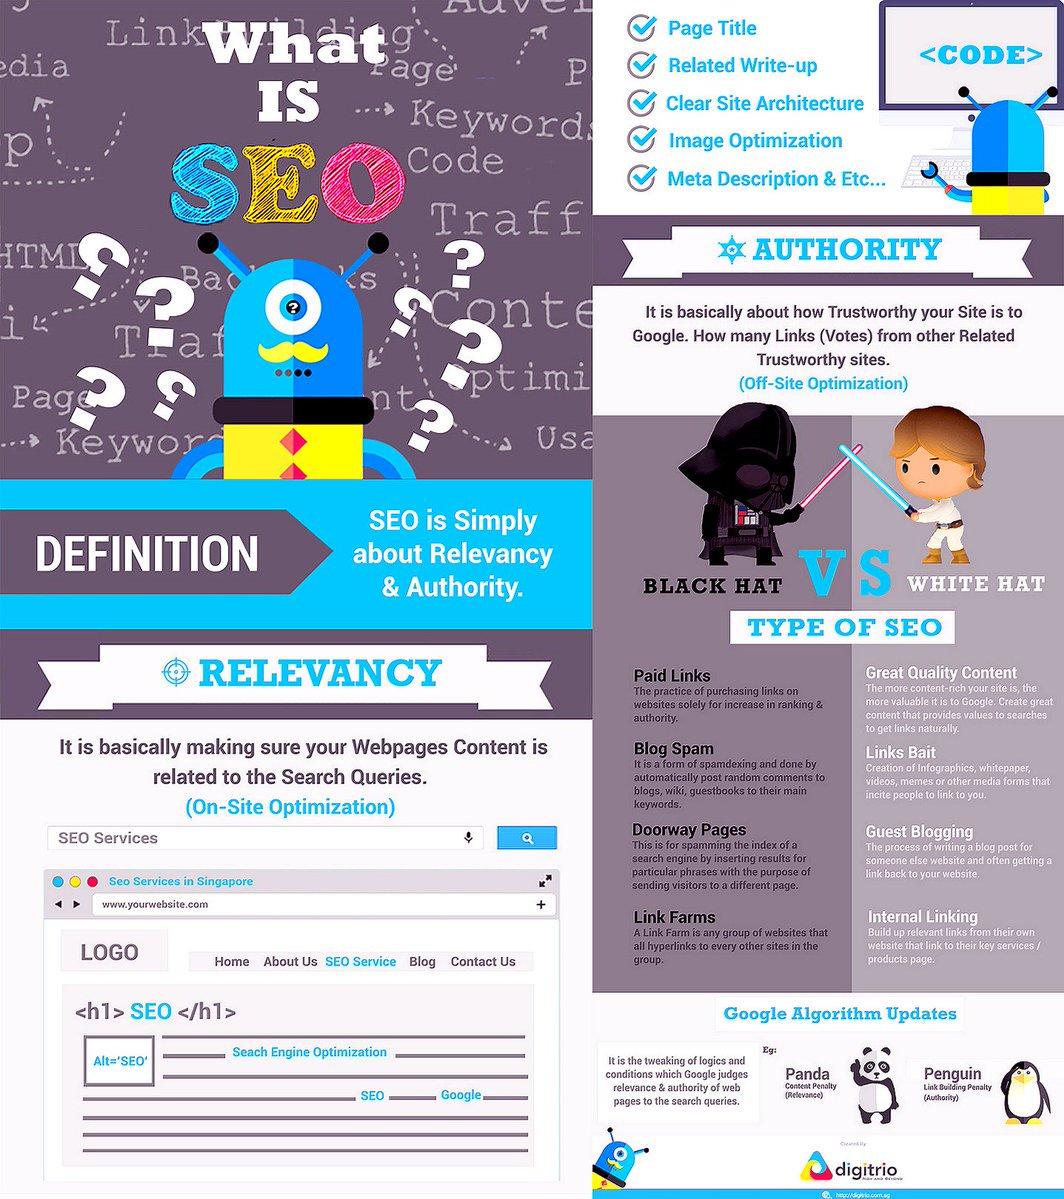 What Is #SEO #SocialMedia #Internetmarketing #Contentmarketing #SMM #Mpgvip #defstar5 #makeyourownlane #DigitalMarketing #Marketing #Abhiseo<br>http://pic.twitter.com/U5jXInDenm